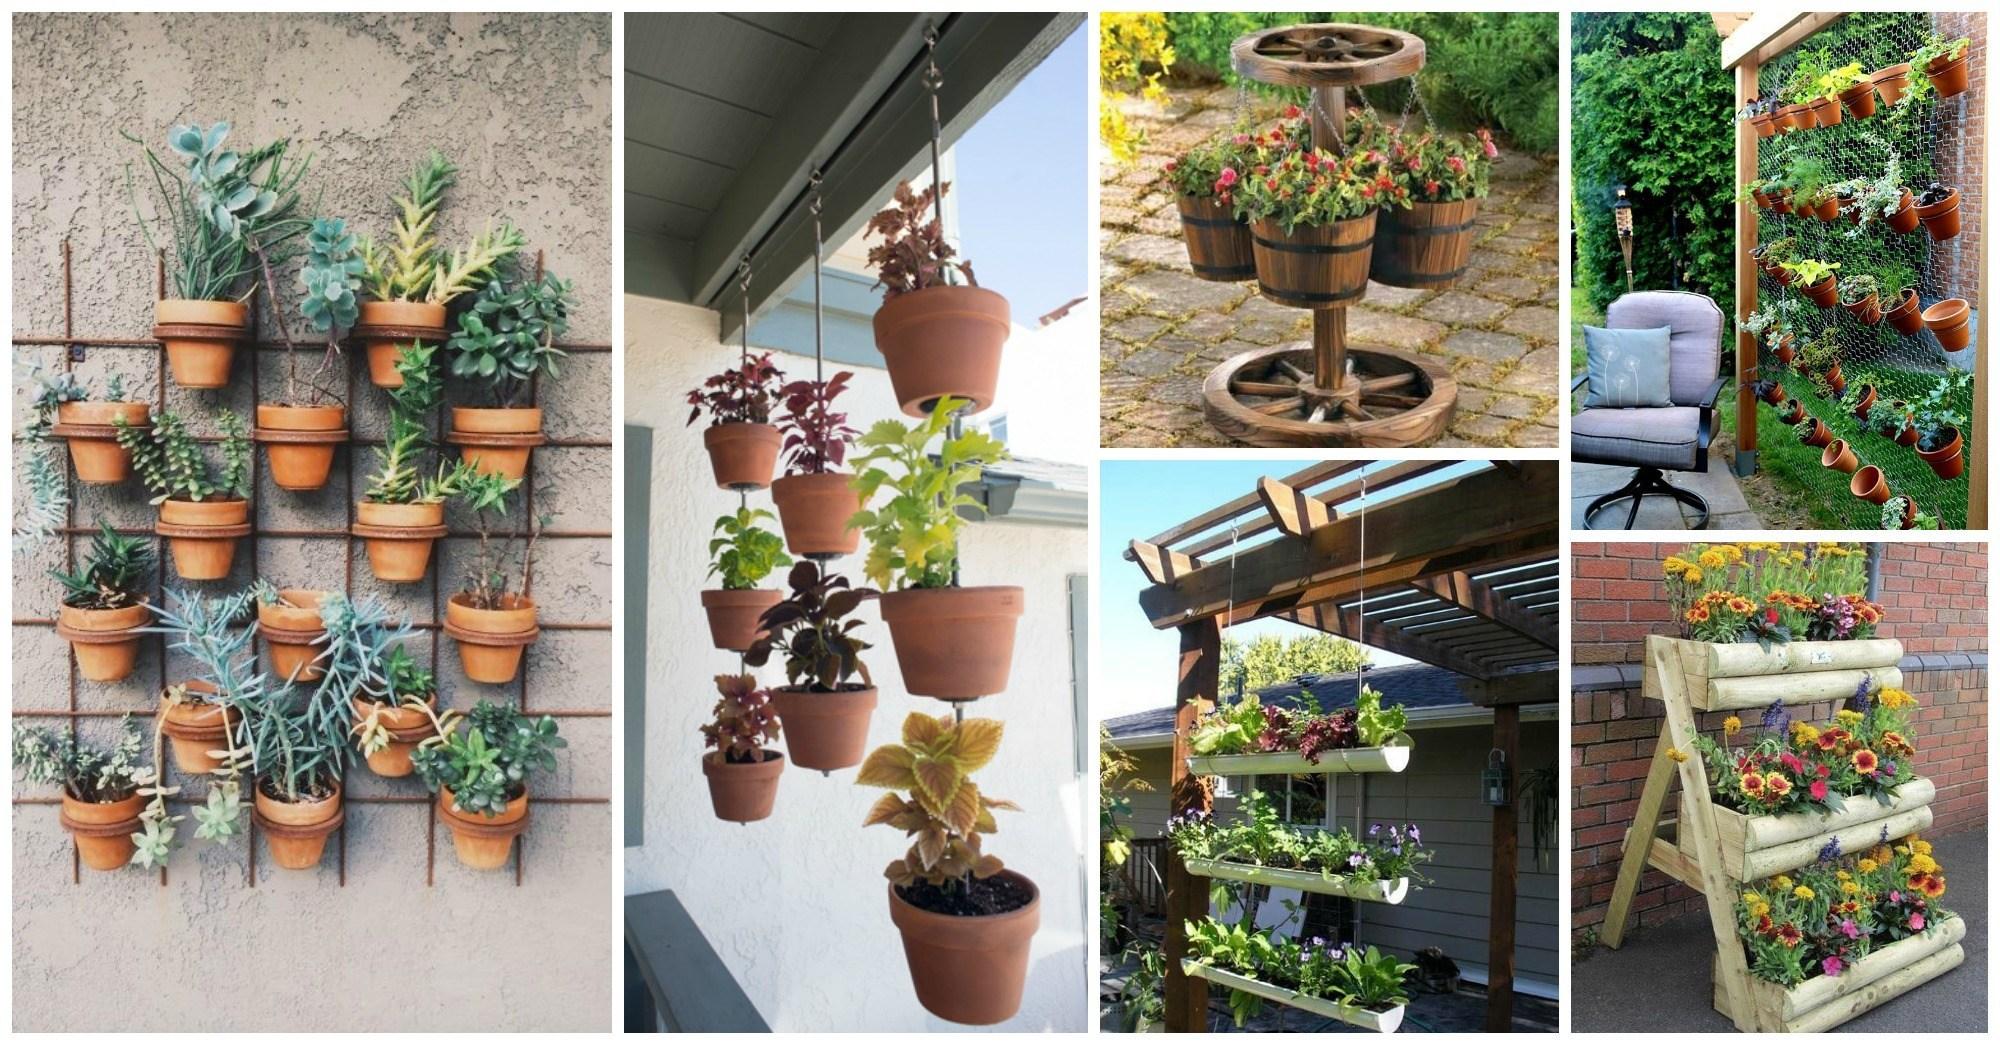 12 Creative DIY Gardens That Will Amaze You